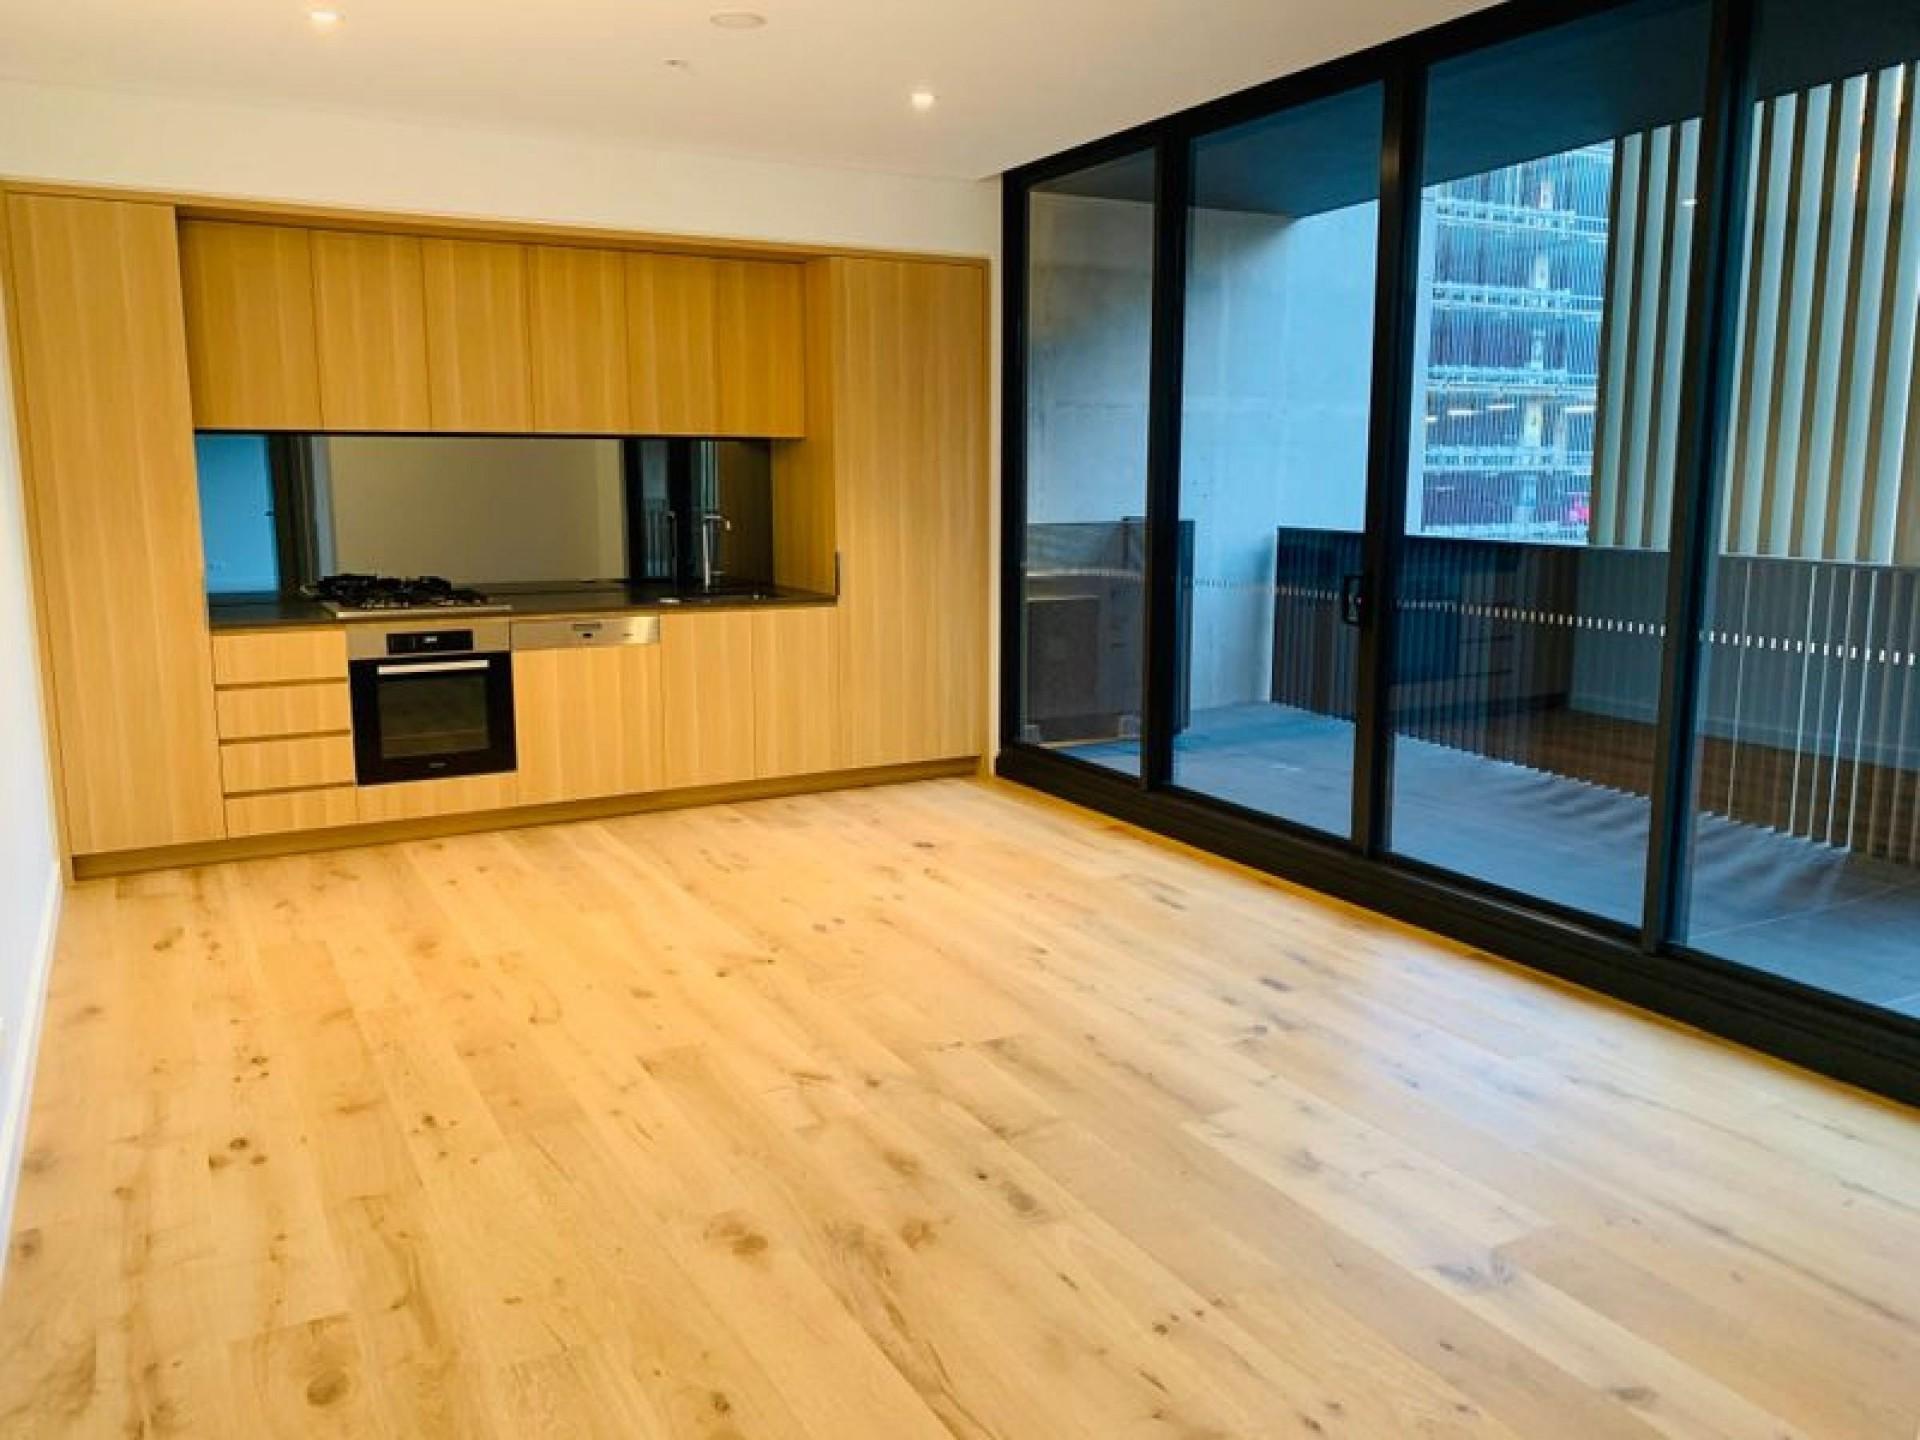 Luxurious Modern Apartment Located in Parramatta CBD